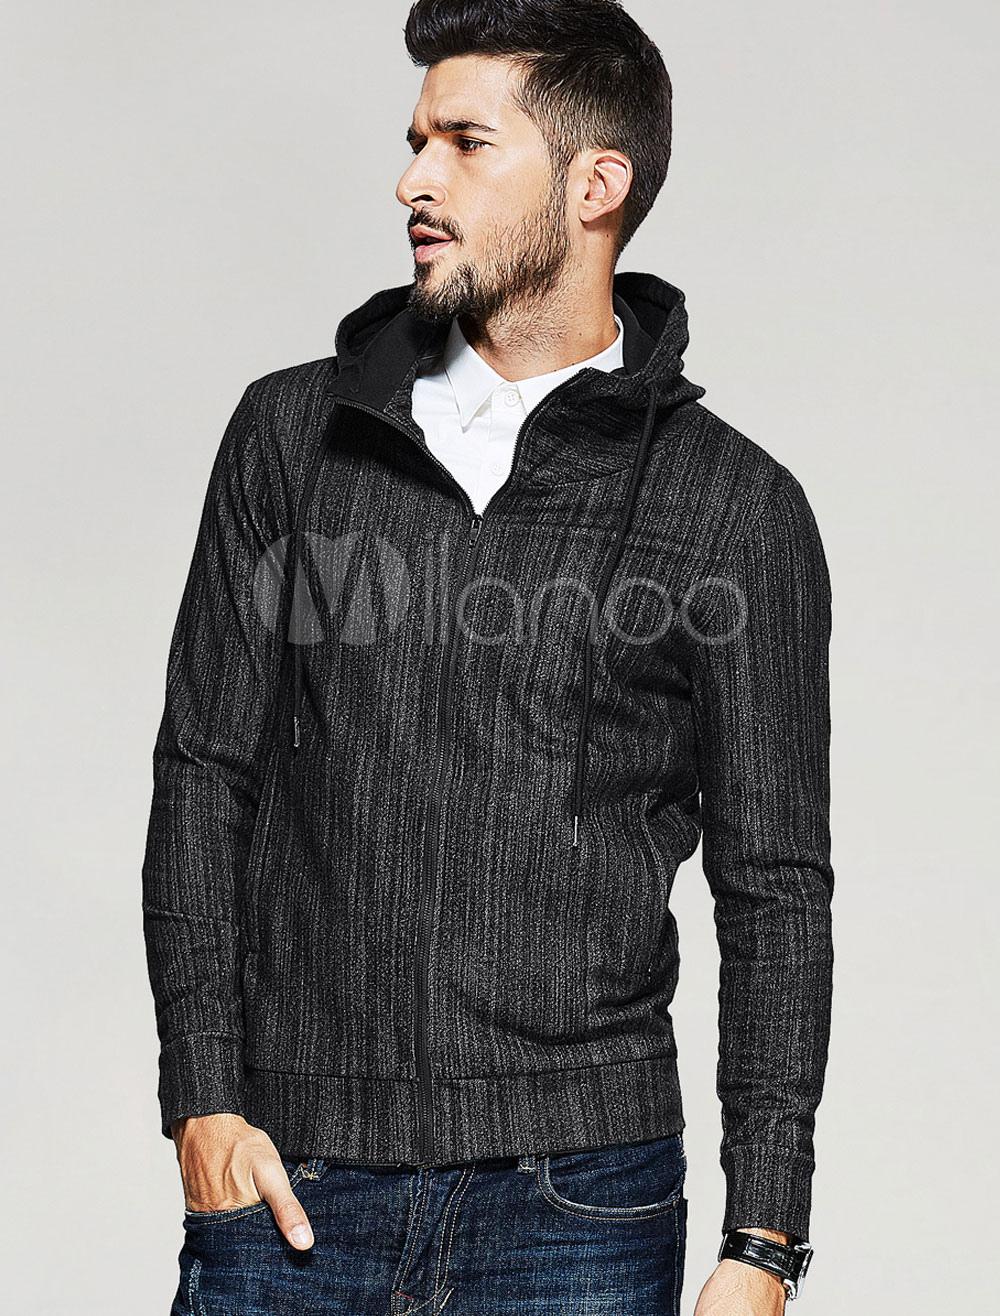 Men's Black Jackets Hooded Long Sleeve Striped Short Jacket thumbnail